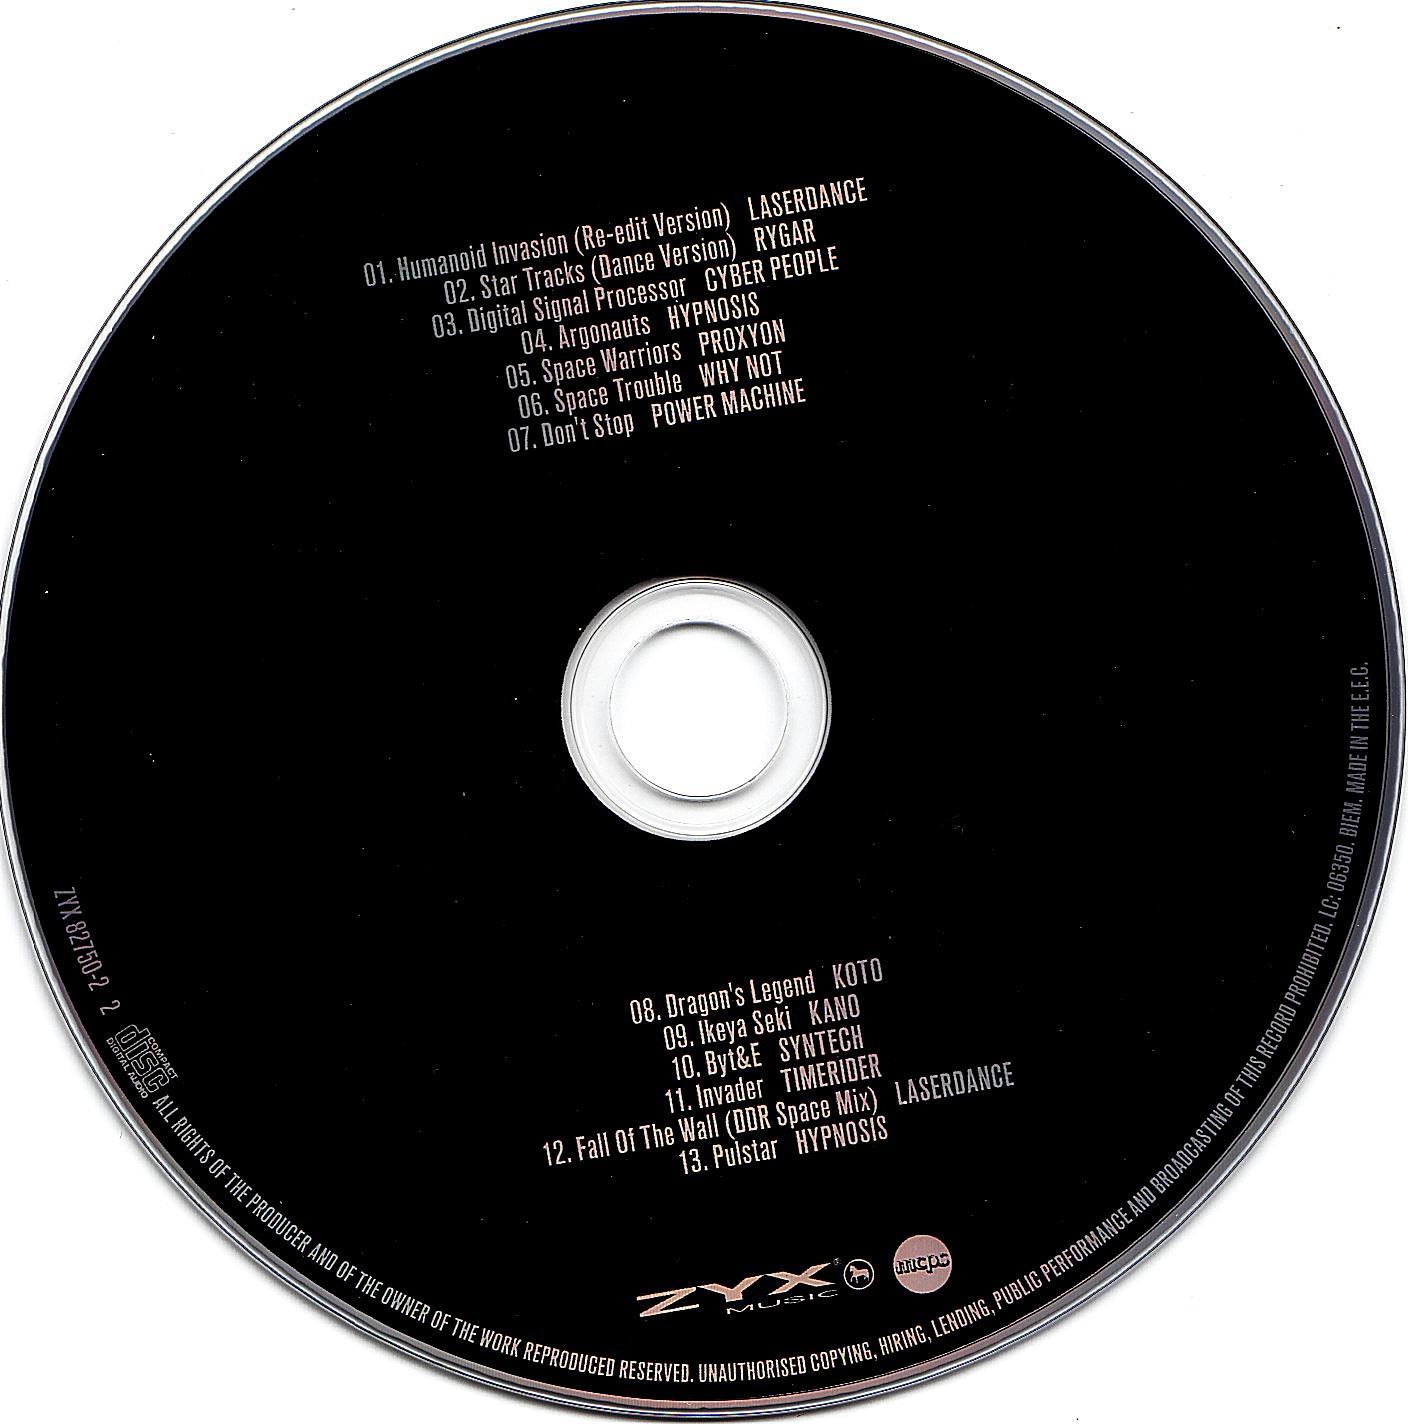 (Spacesynth) [CD] Laserdance